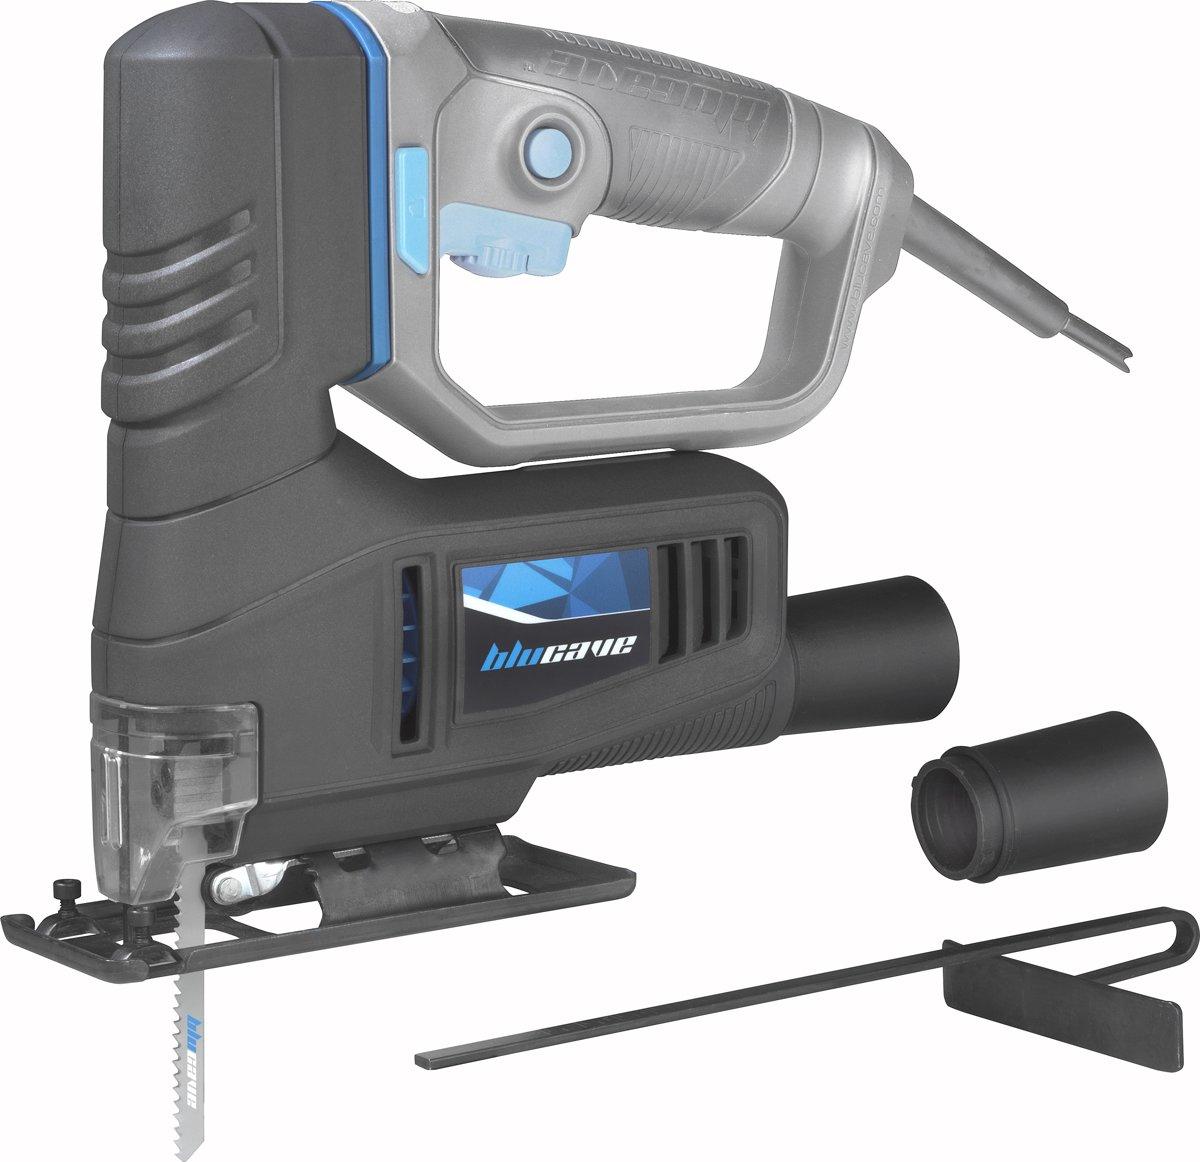 Blucave AC Decoupeerzaag - Toolbod - Exclusief AC Controller